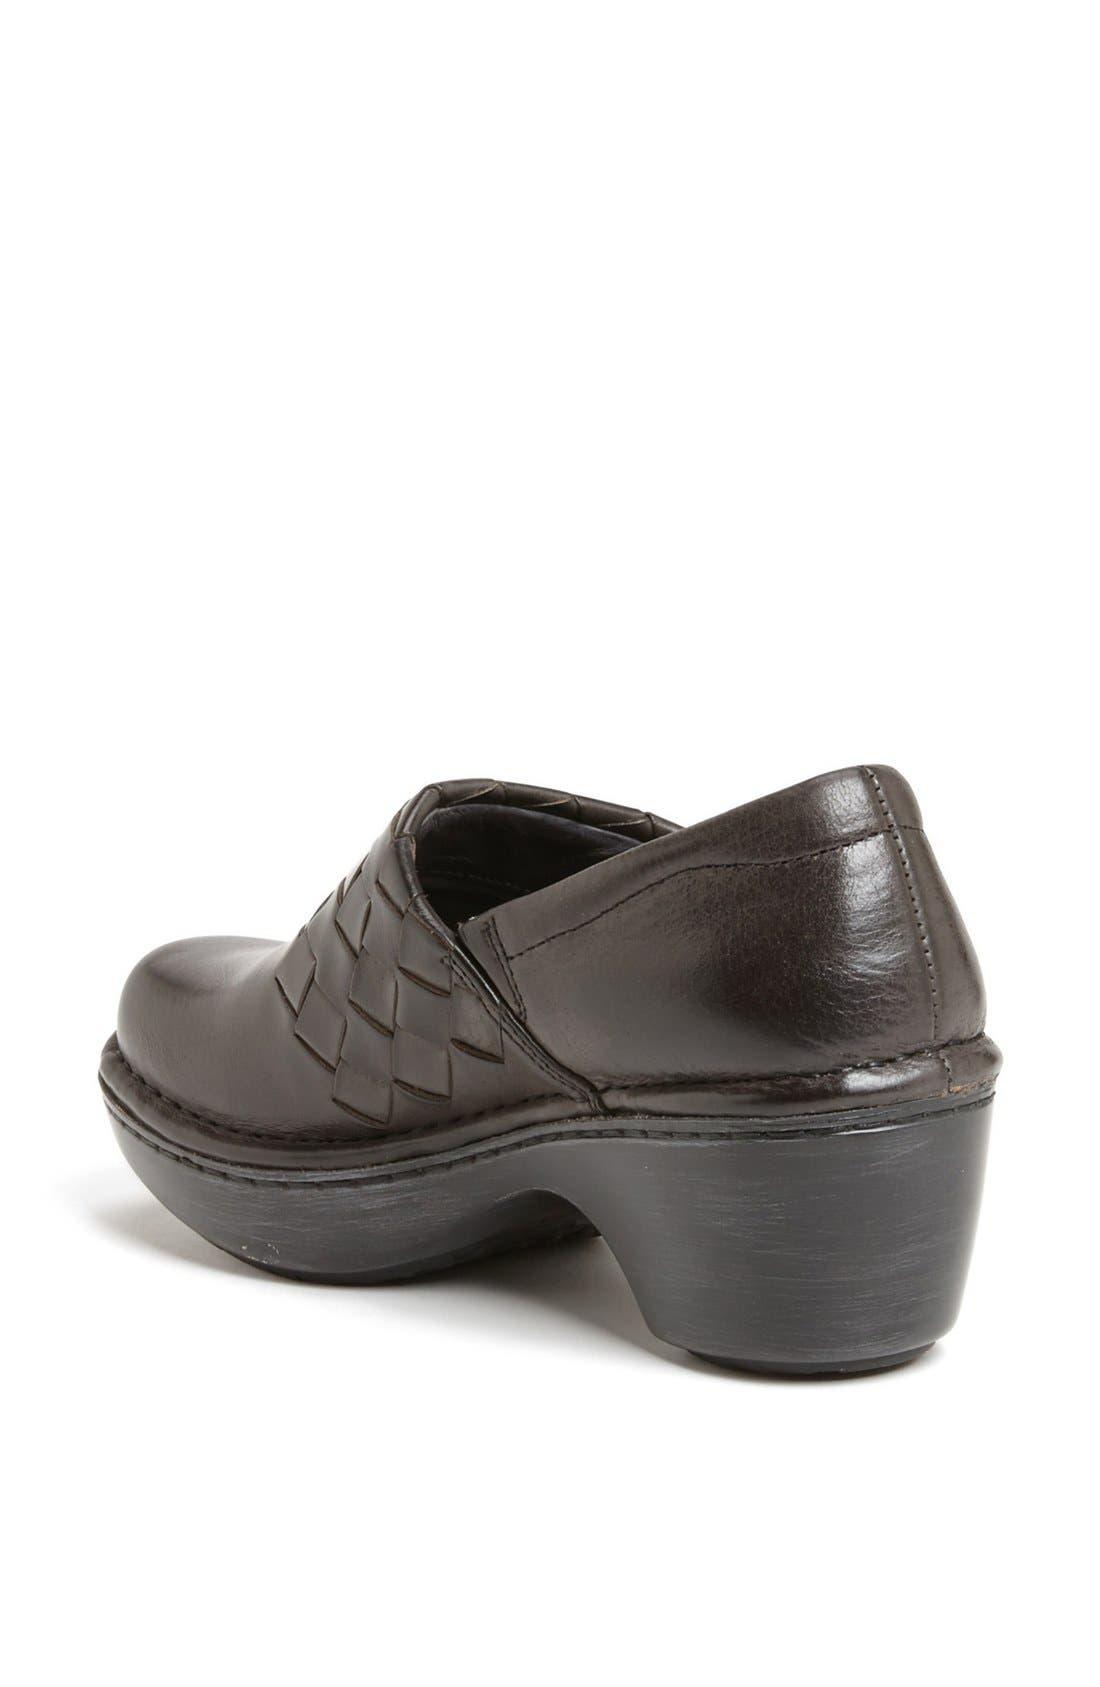 Alternate Image 2  - Ariat 'Ashbourne' Woven Leather Clog